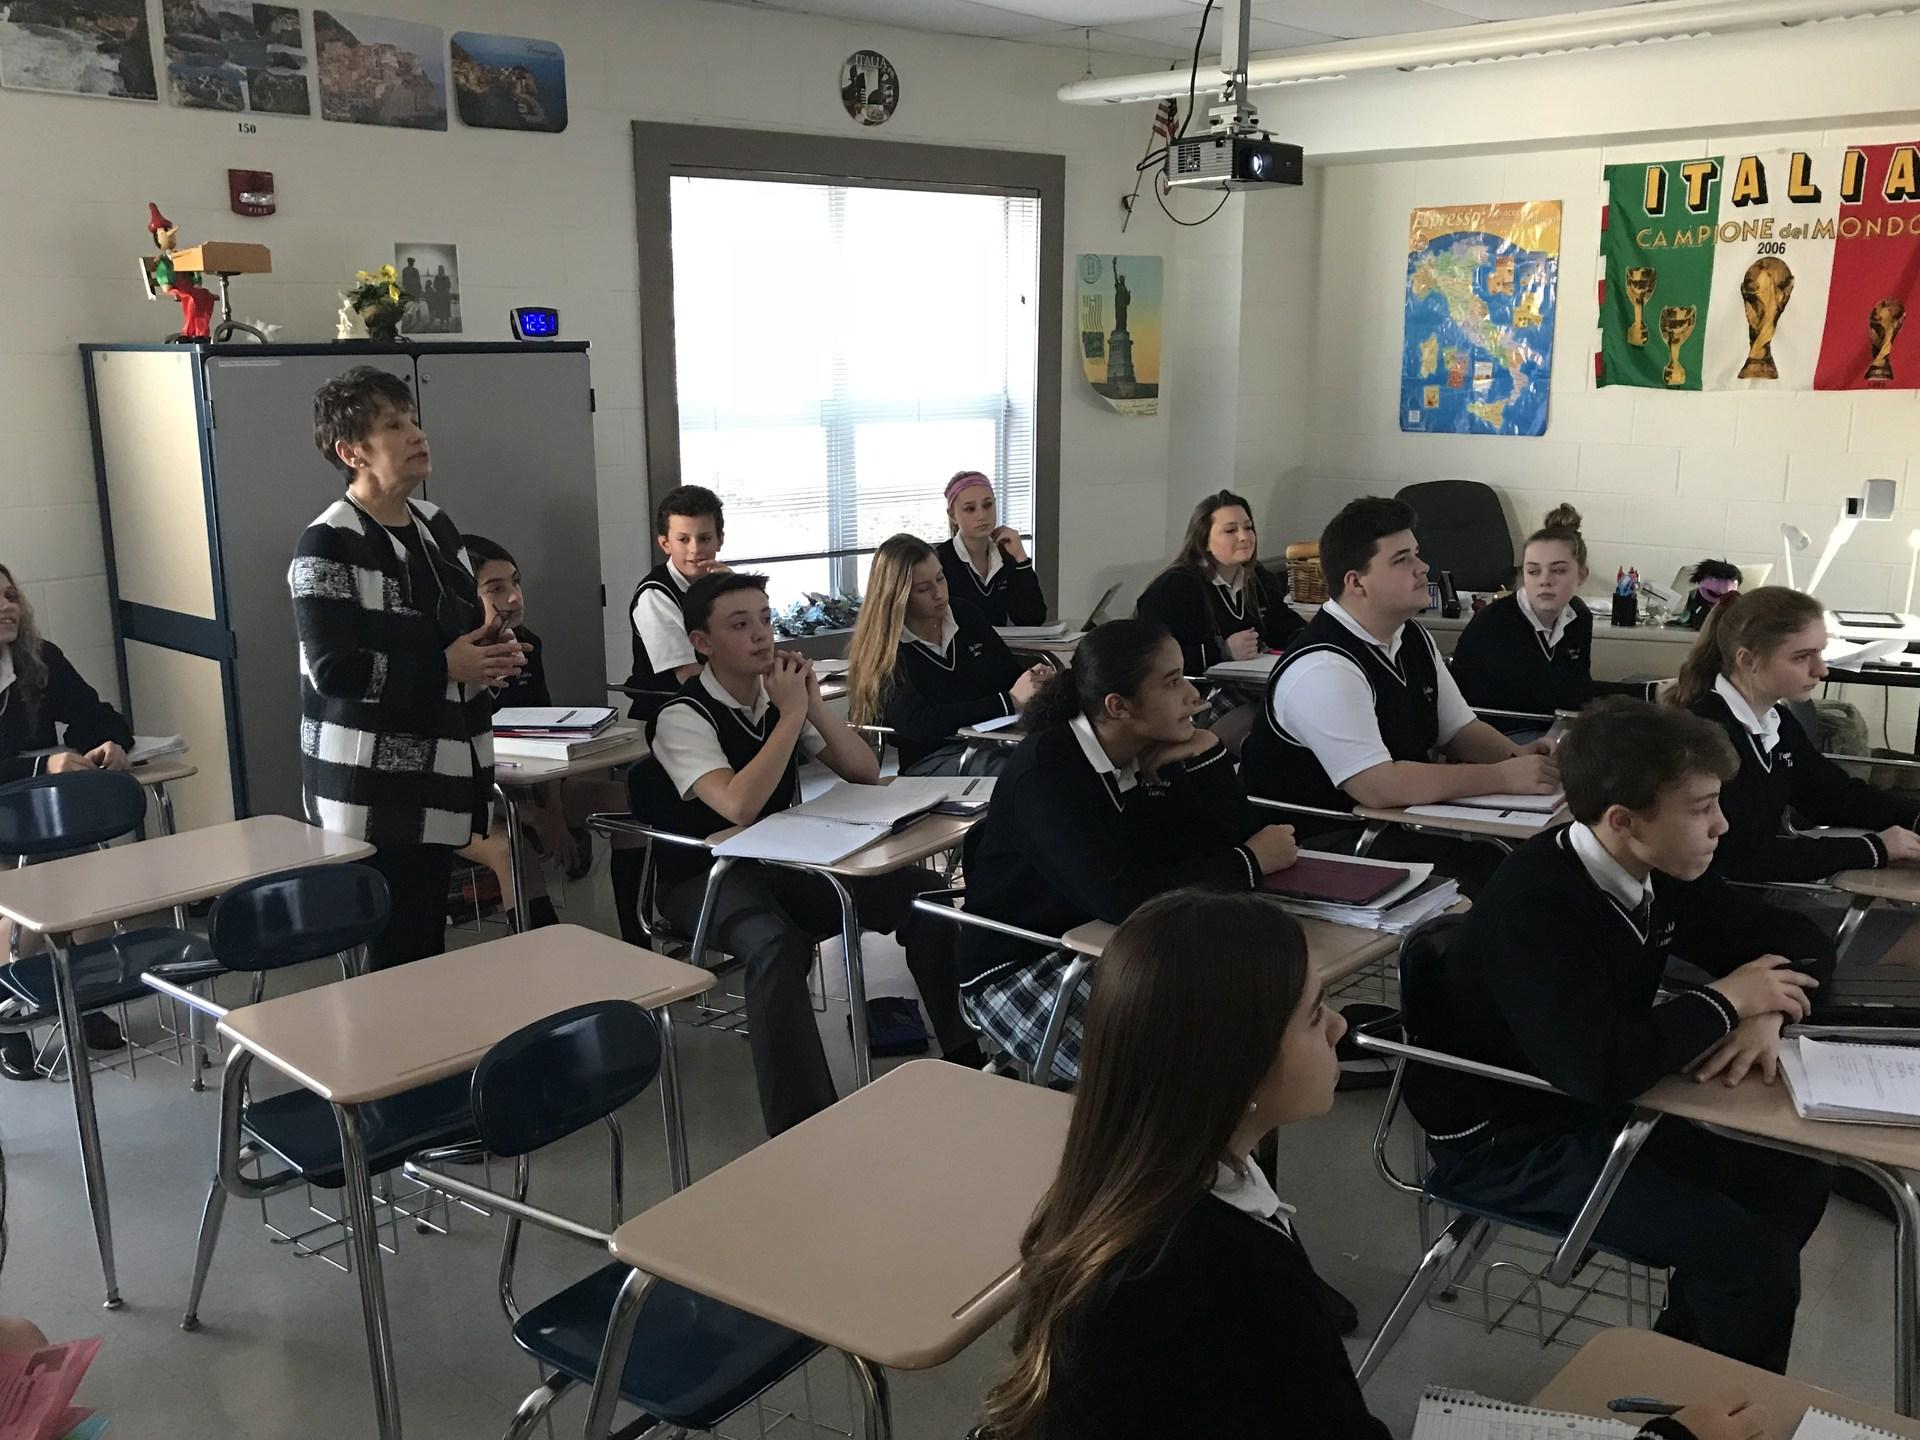 Italian teacher asking students questions